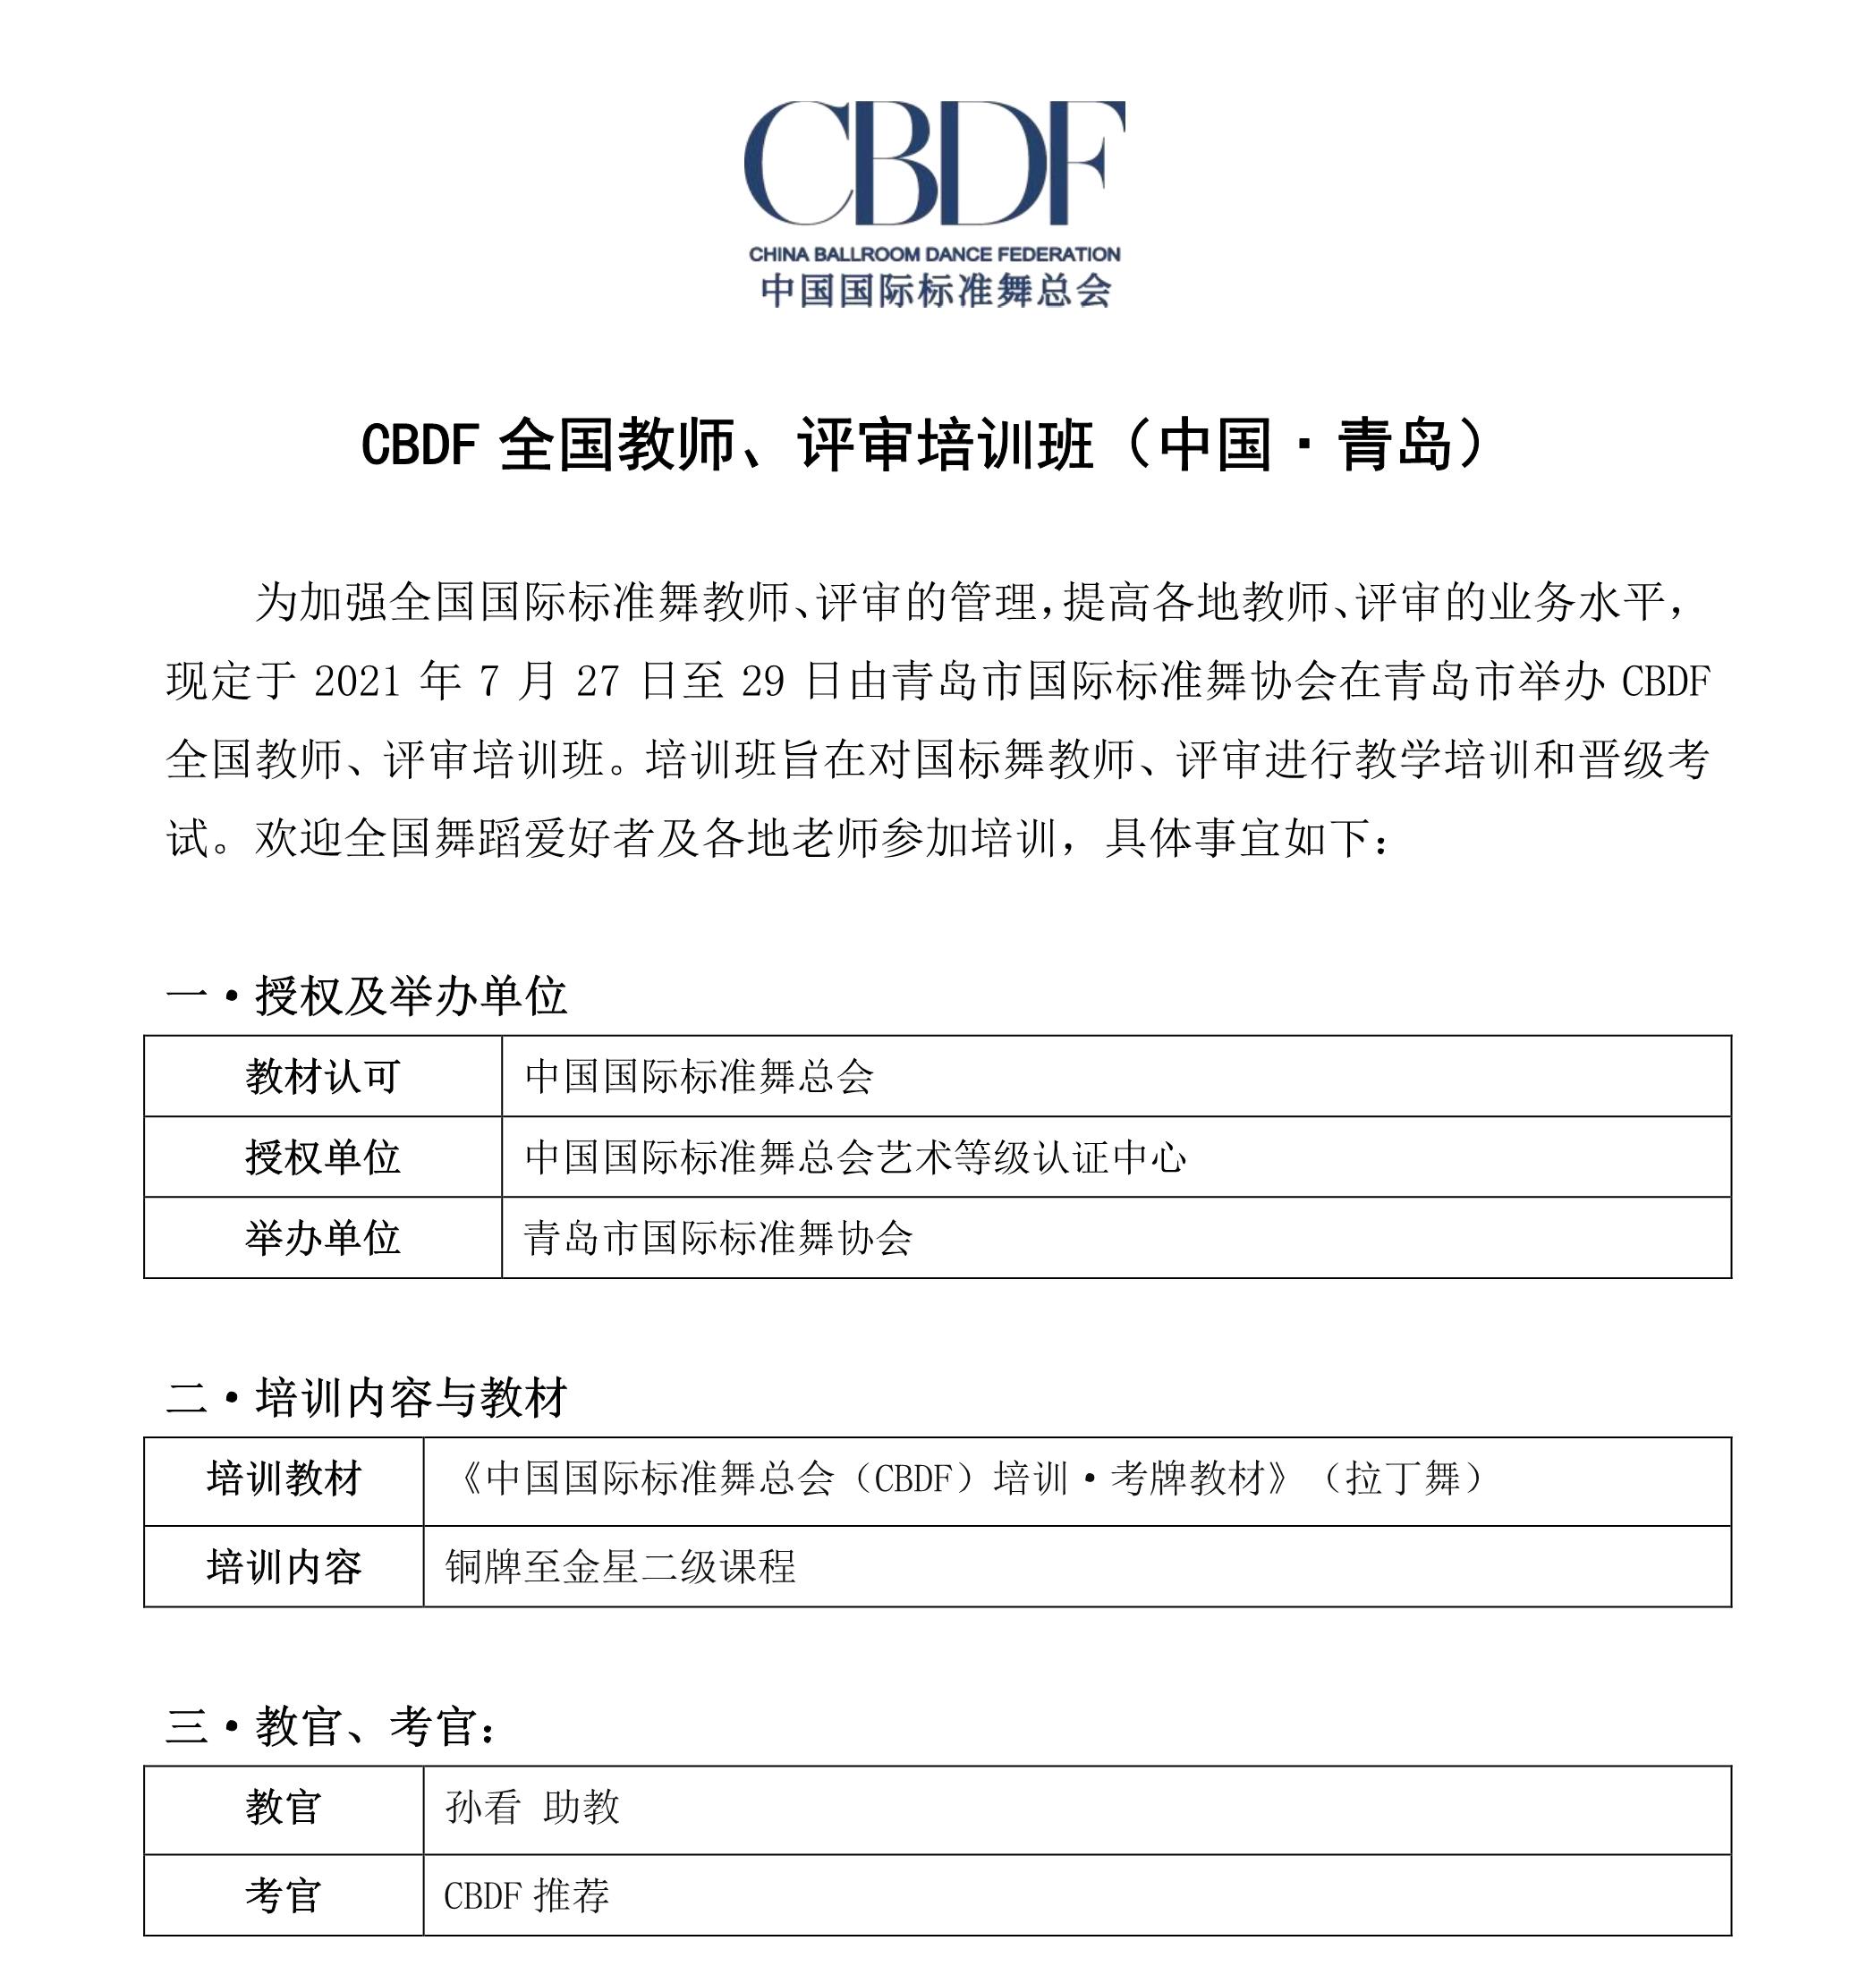 CBDF全国教师、评审培训班(中国·青岛)(图1)